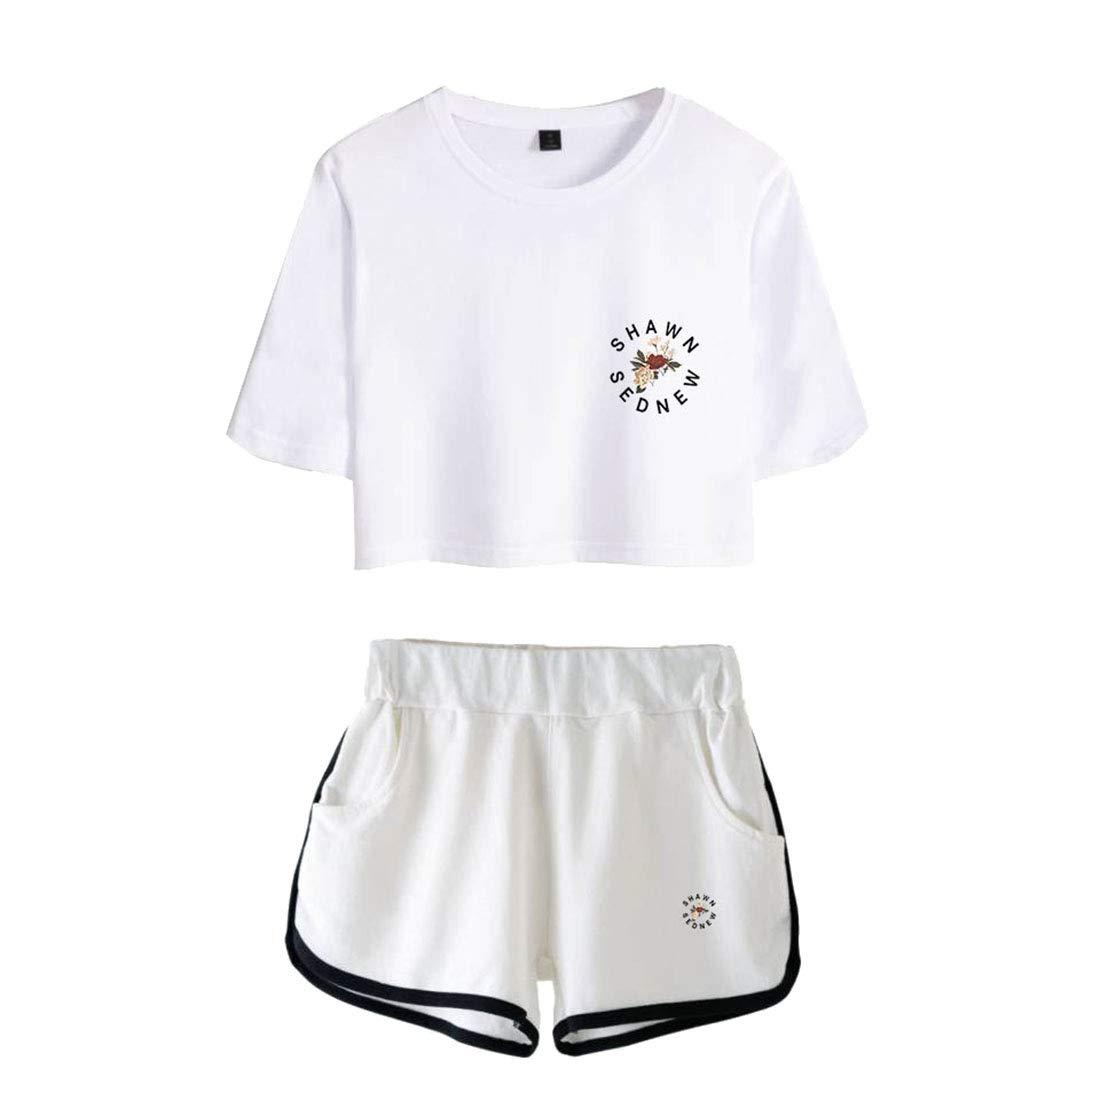 83edd1002b949 CTOOO T-Shirts Shorts Shawn Mendes Vêtements Commémoratifs Femme Ado Casual  Ete XS-XXL Shorts et bermudas Vêtements